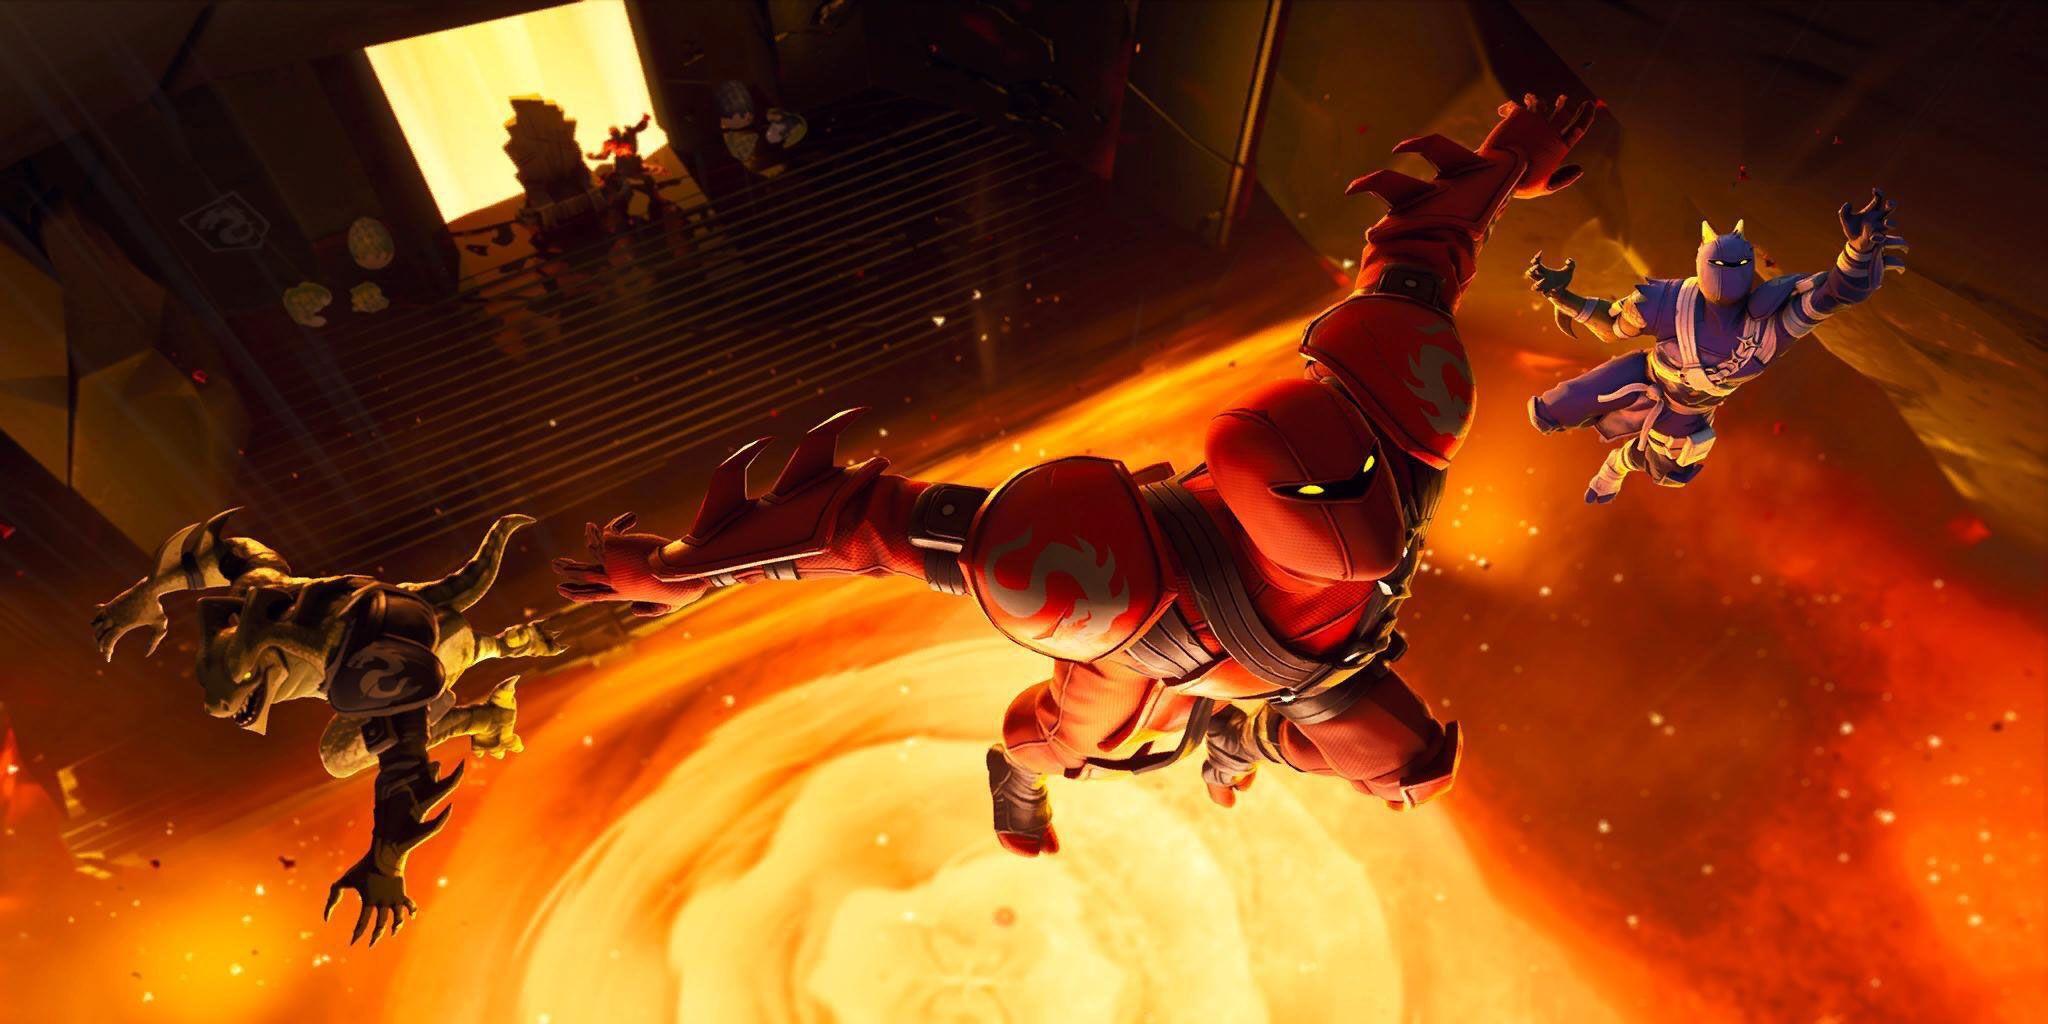 Fortnite Loading Screen Wallpaper Fortnite Temporadas Fortnite Personajes